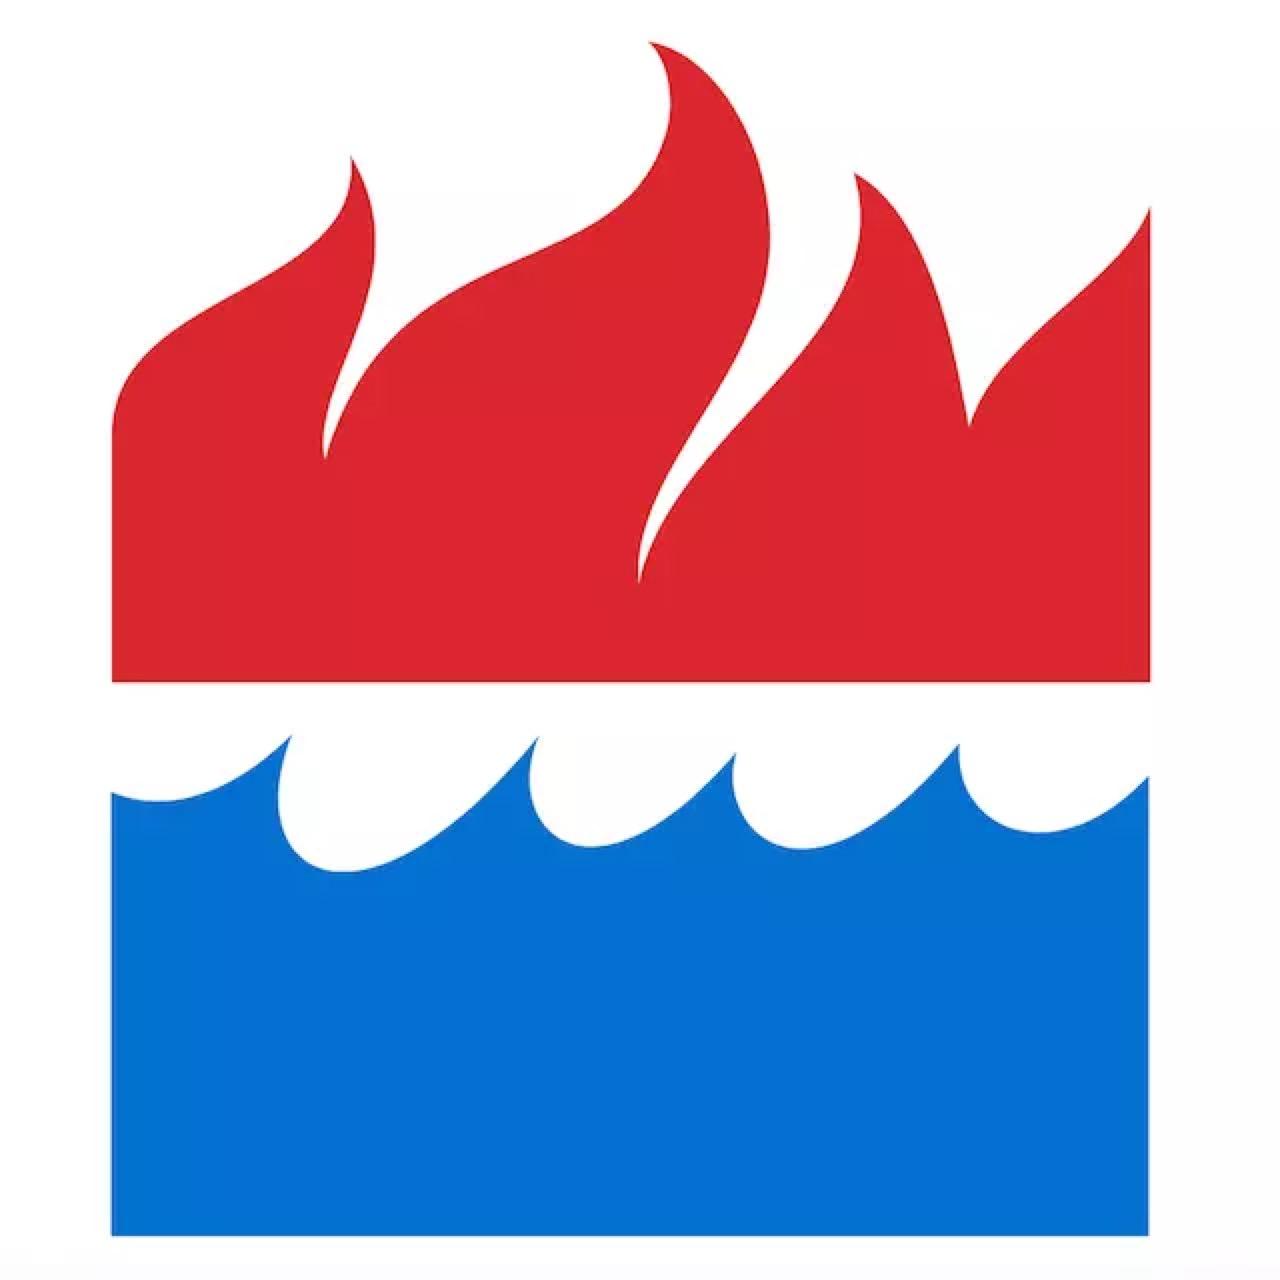 为出版社 Harper Collins 设计的 logo